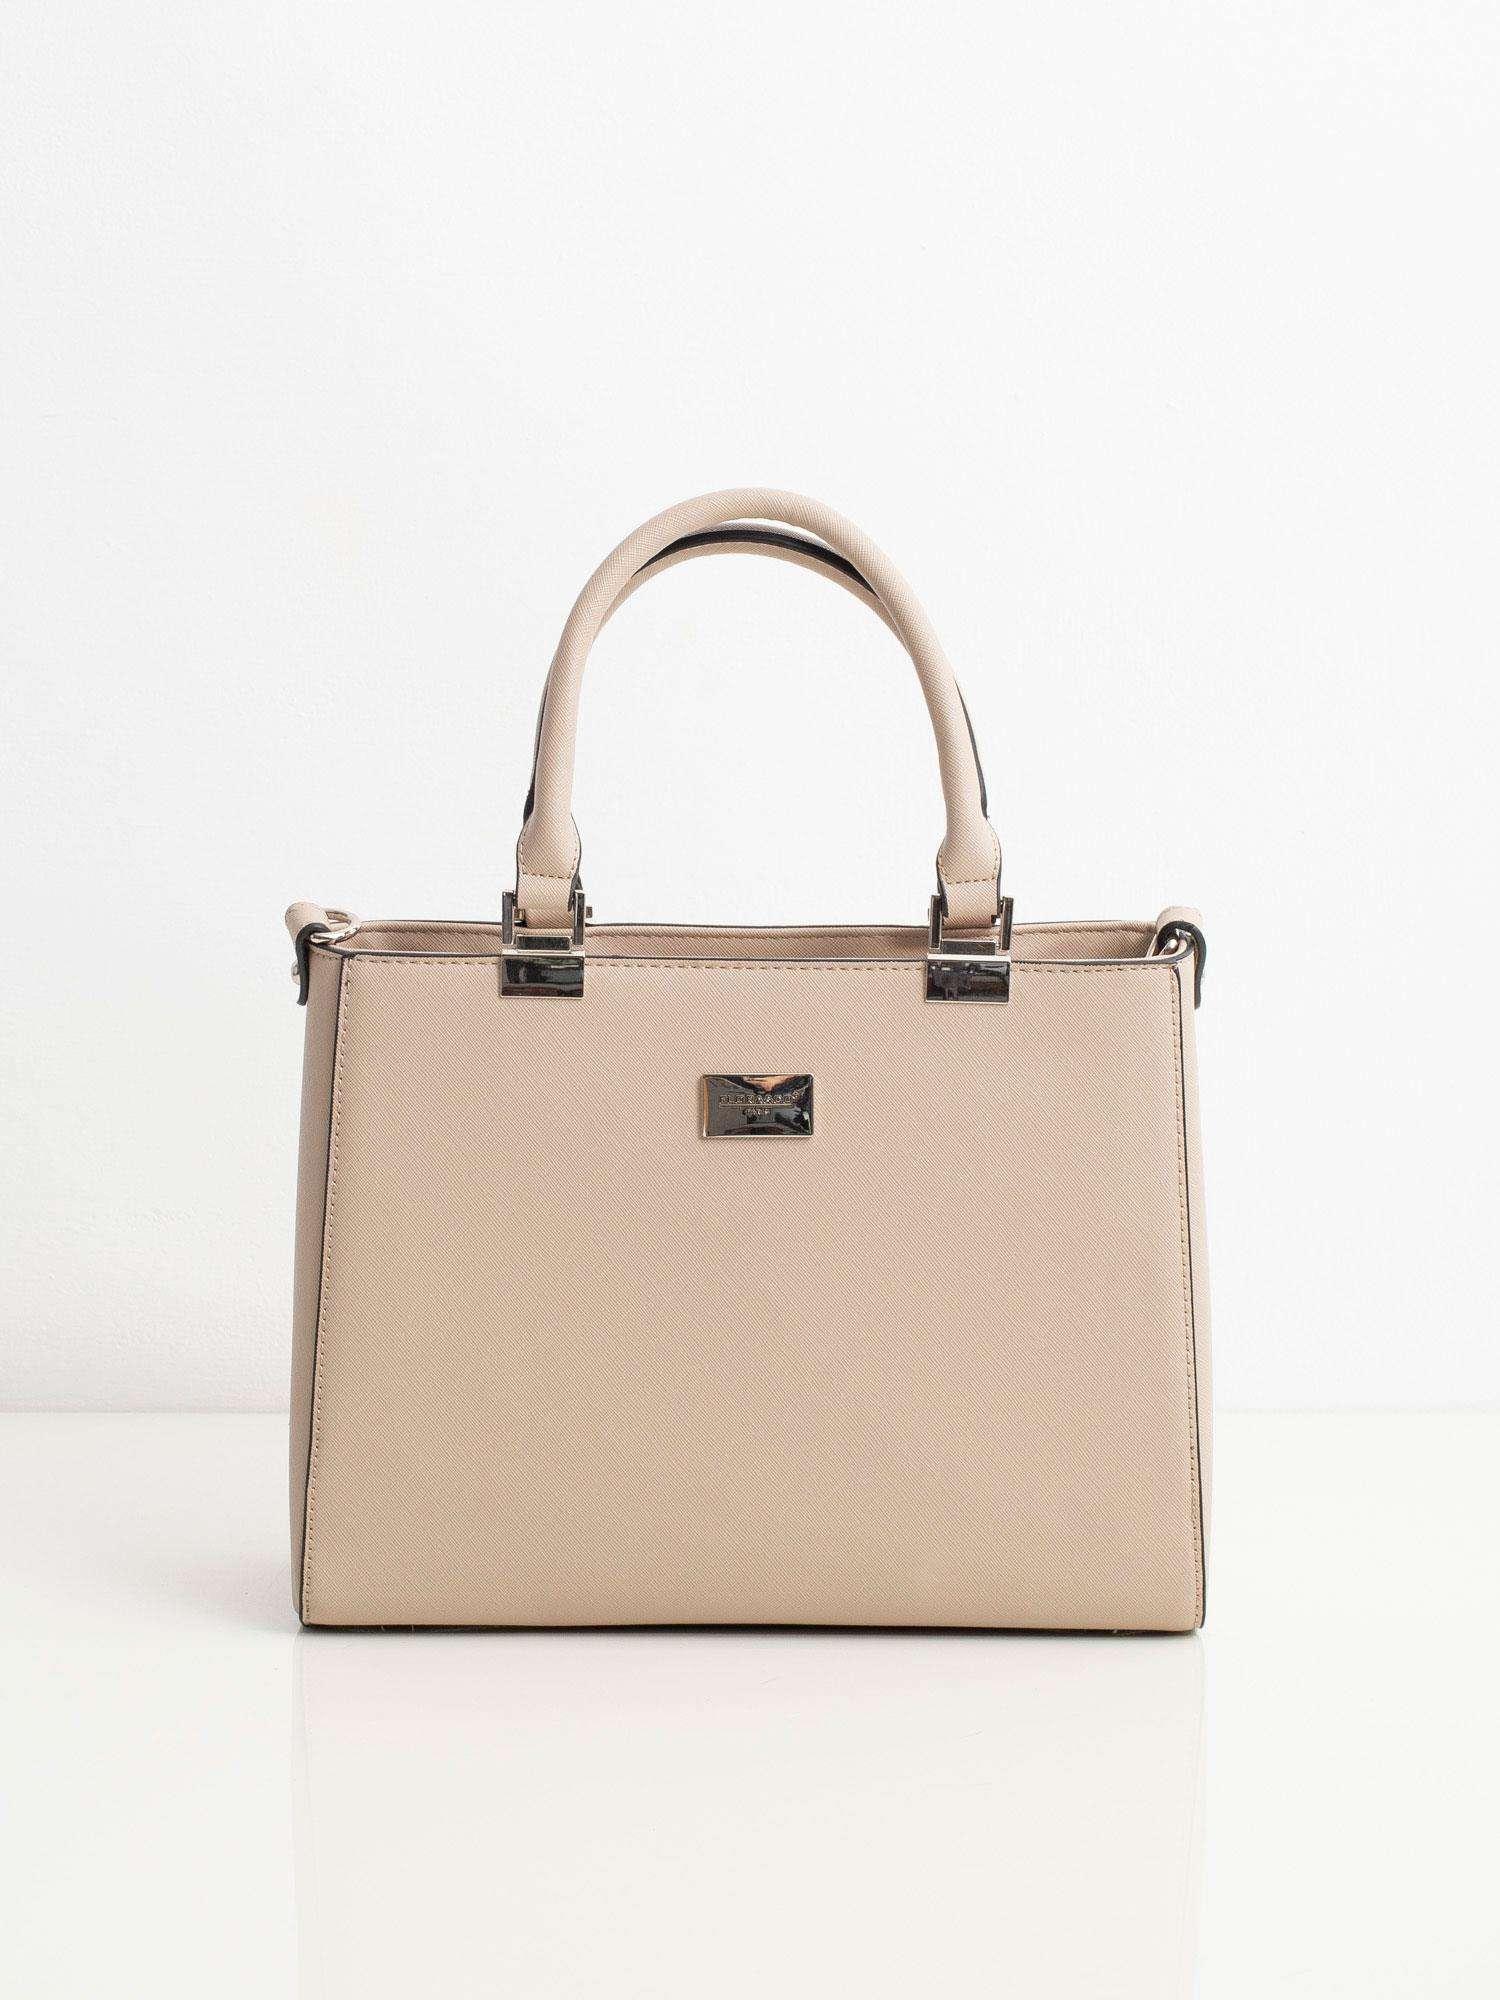 Elegantná béžová kabelka na rameno - UNI